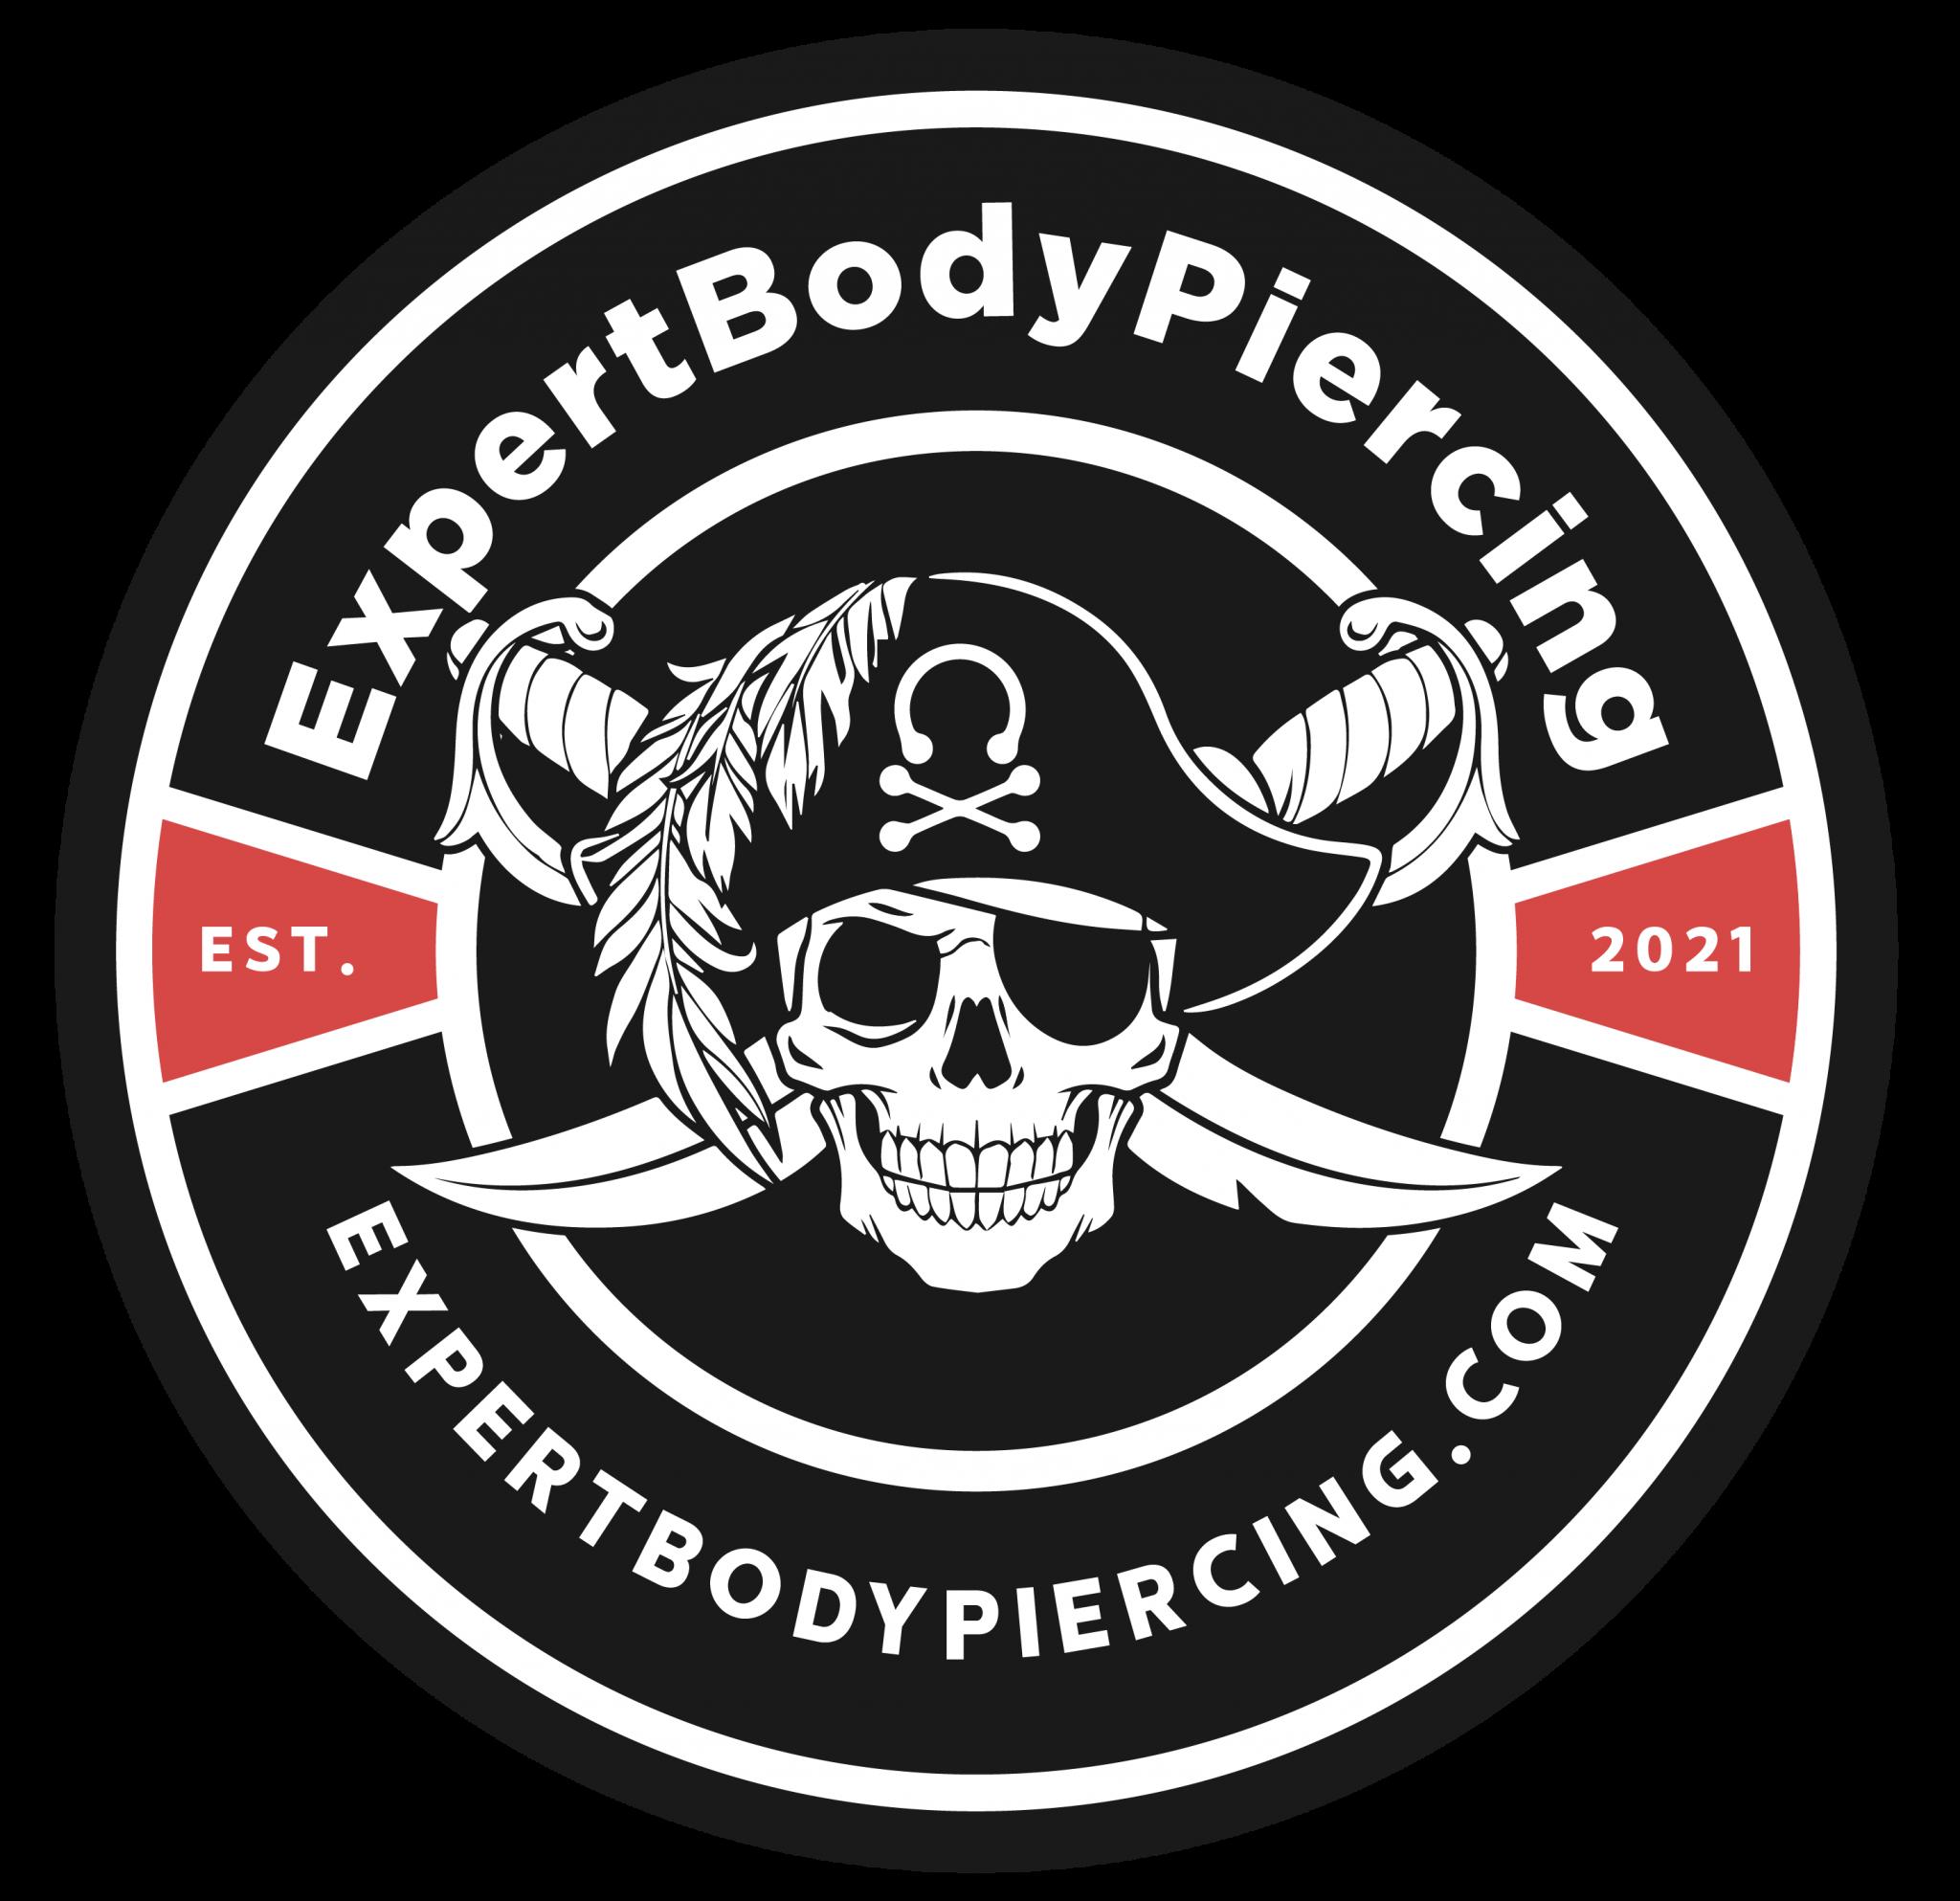 expert body piercing